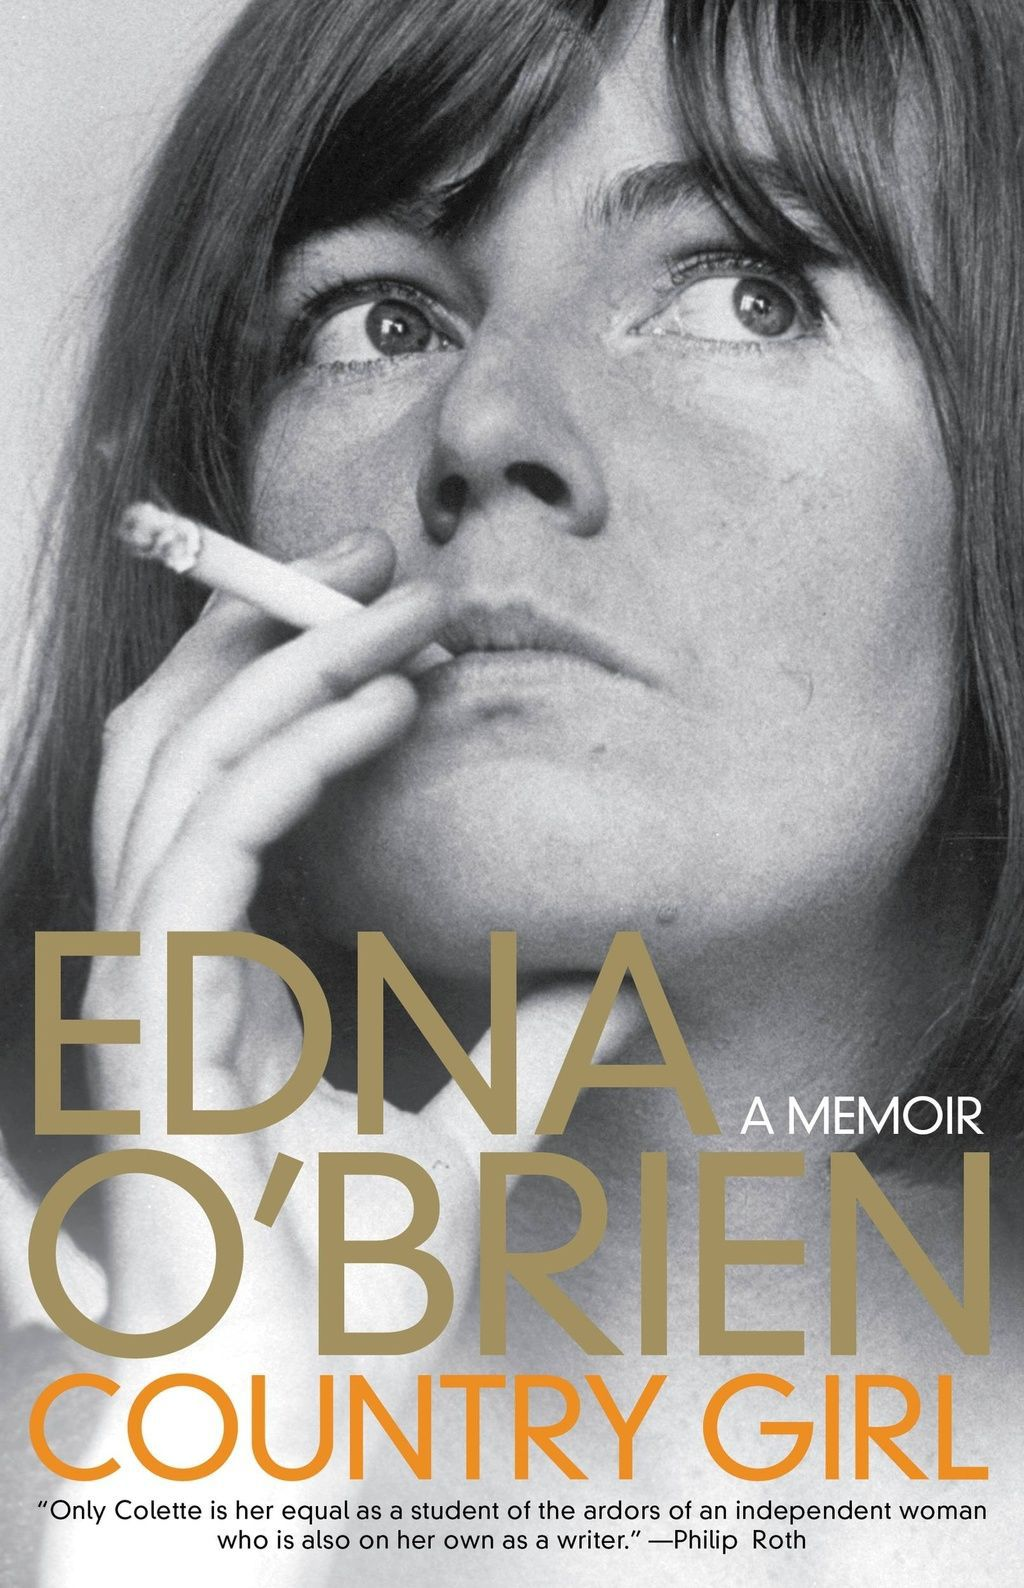 'Country Girl's' life on display in memoir